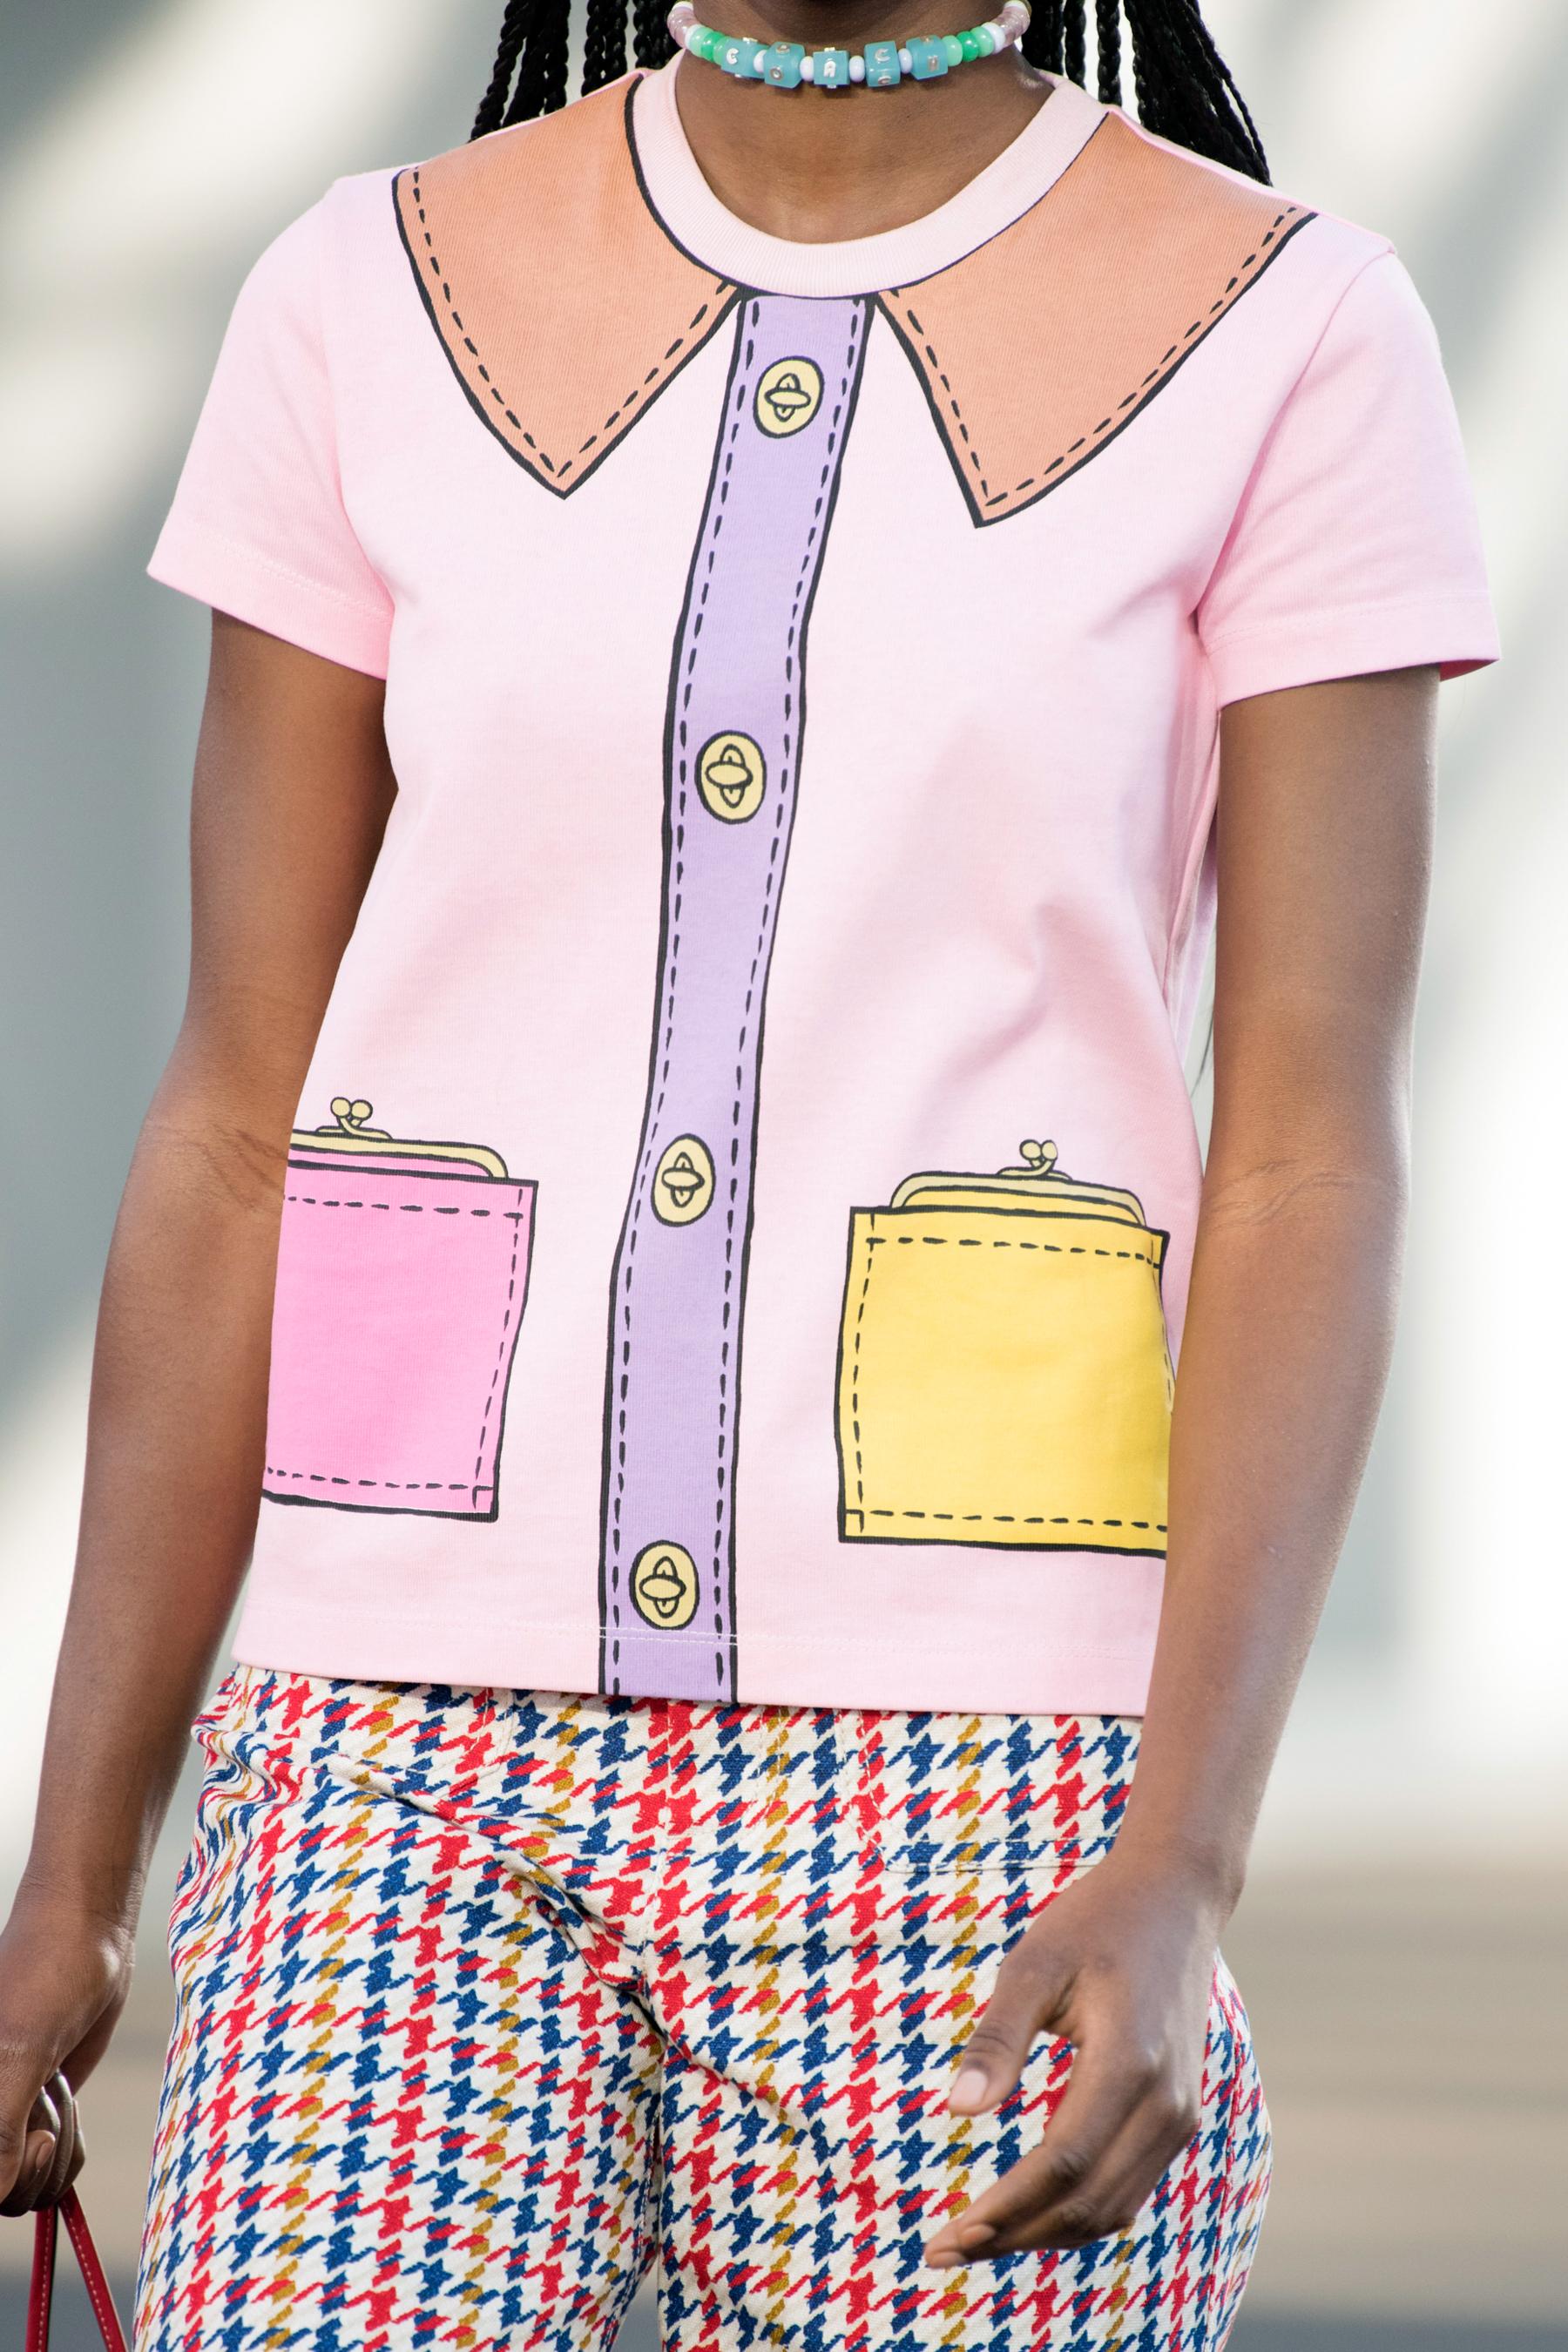 Coach Spring 2022 Details Fashion Show